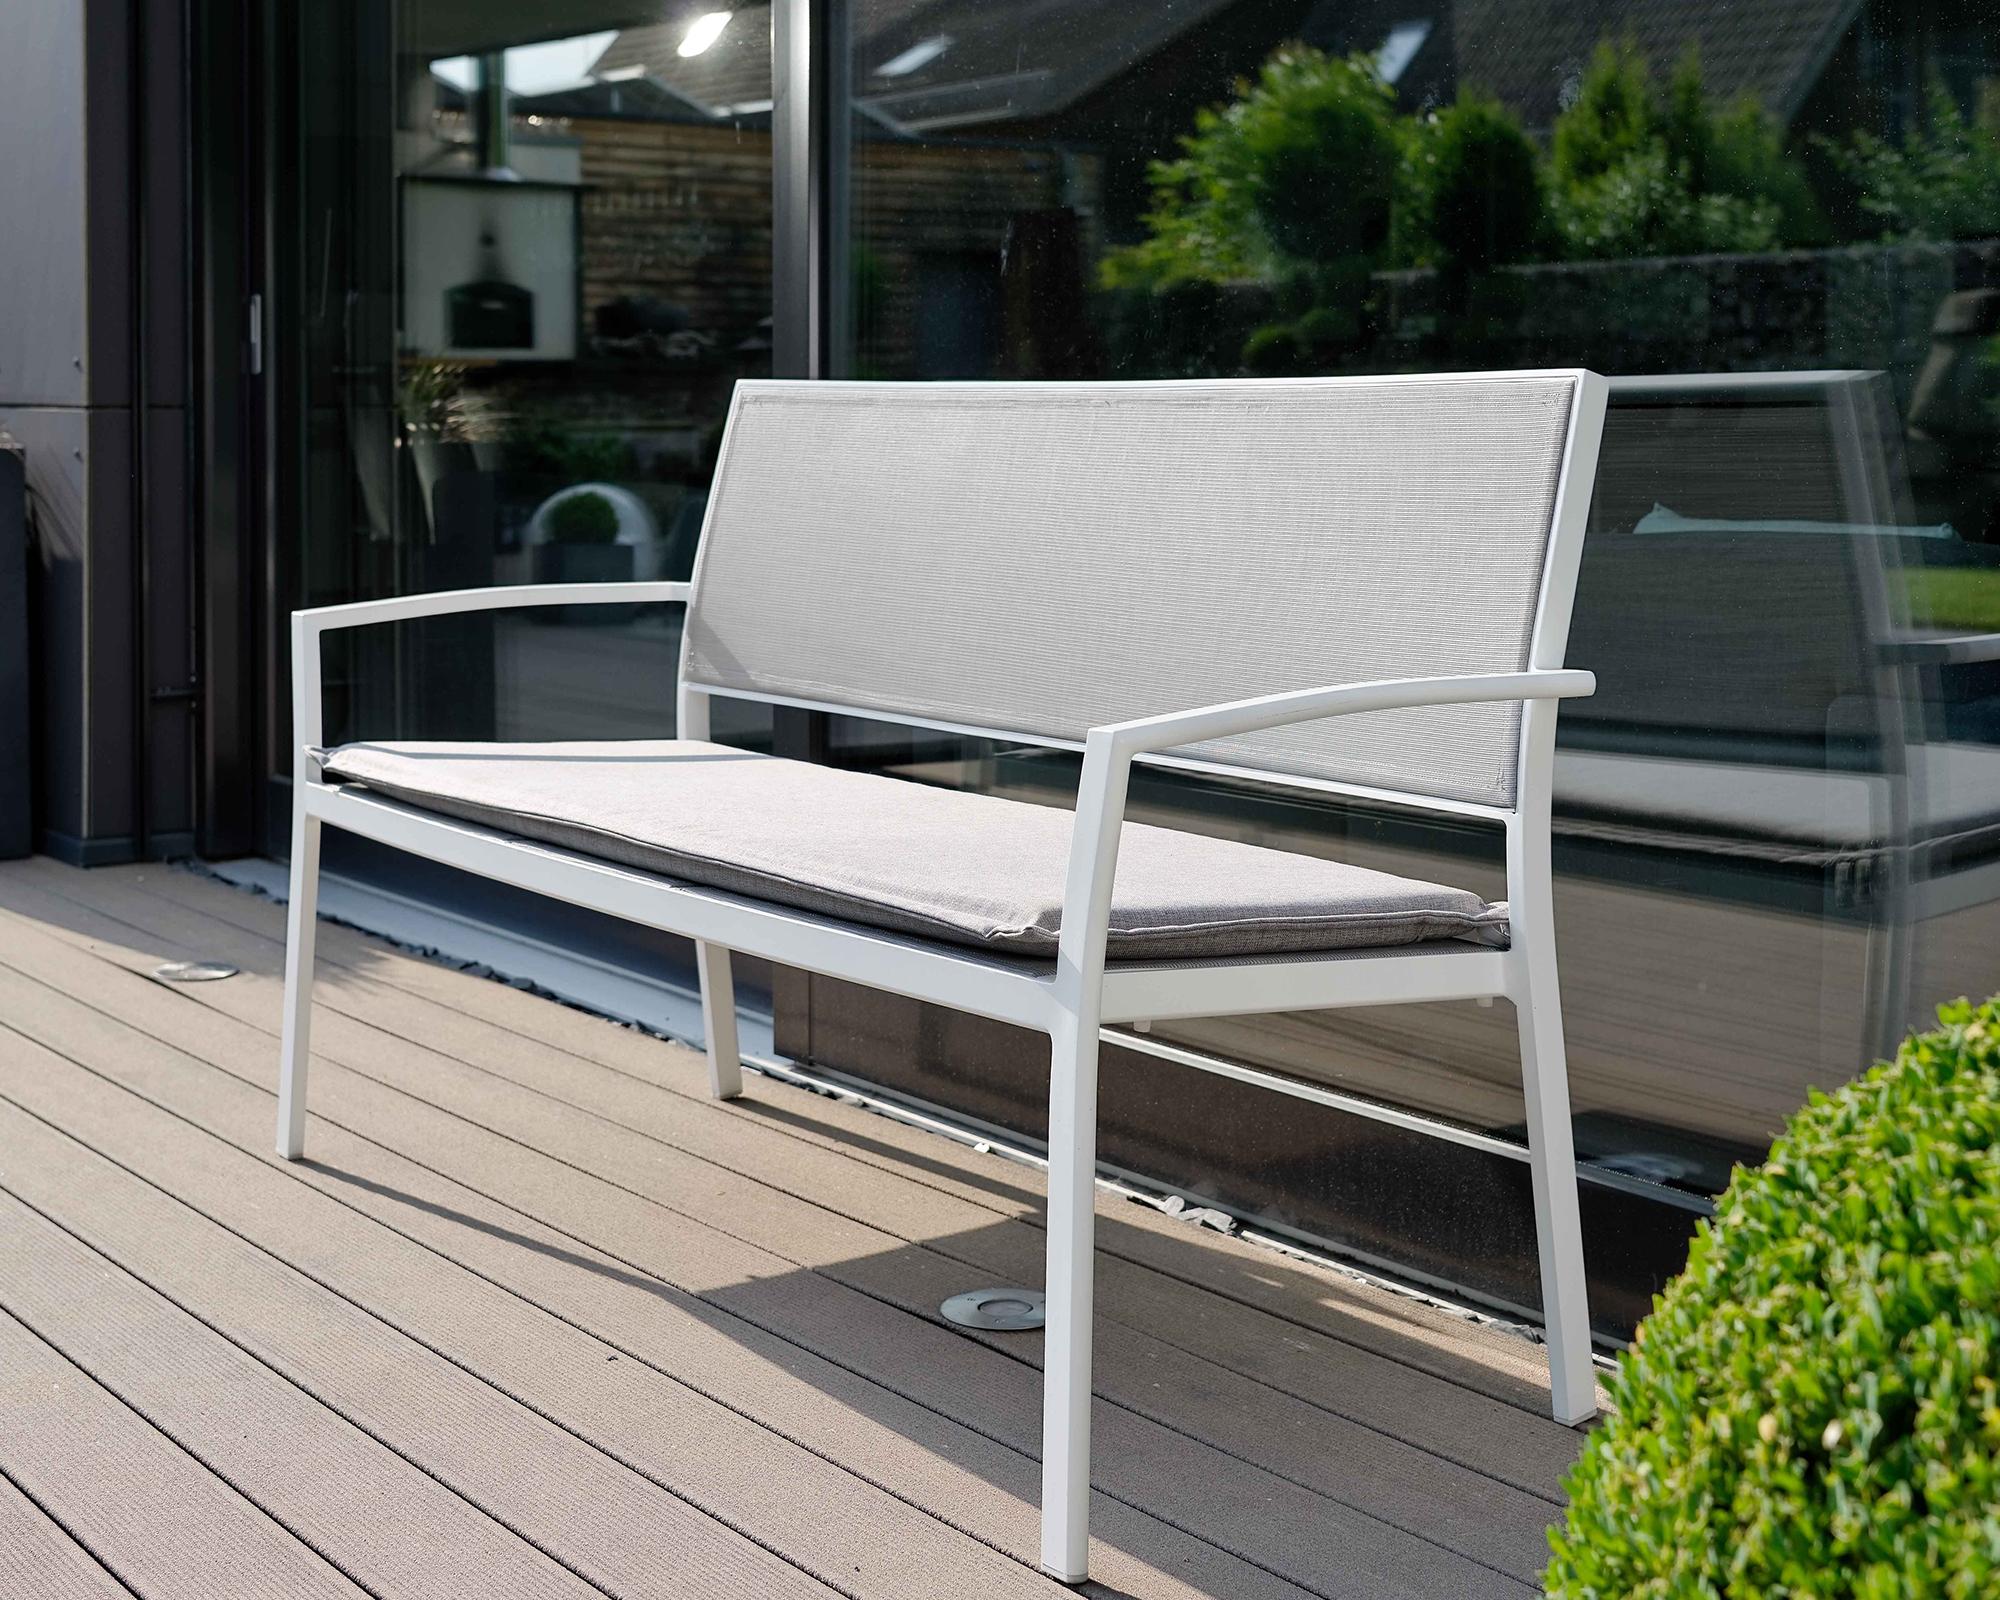 Full Size of Aldi Gartenbank Rattan Klappbar 2020 2017 2018 2019 Weiss Aluminium Relaxsessel Garten Wohnzimmer Aldi Gartenbank